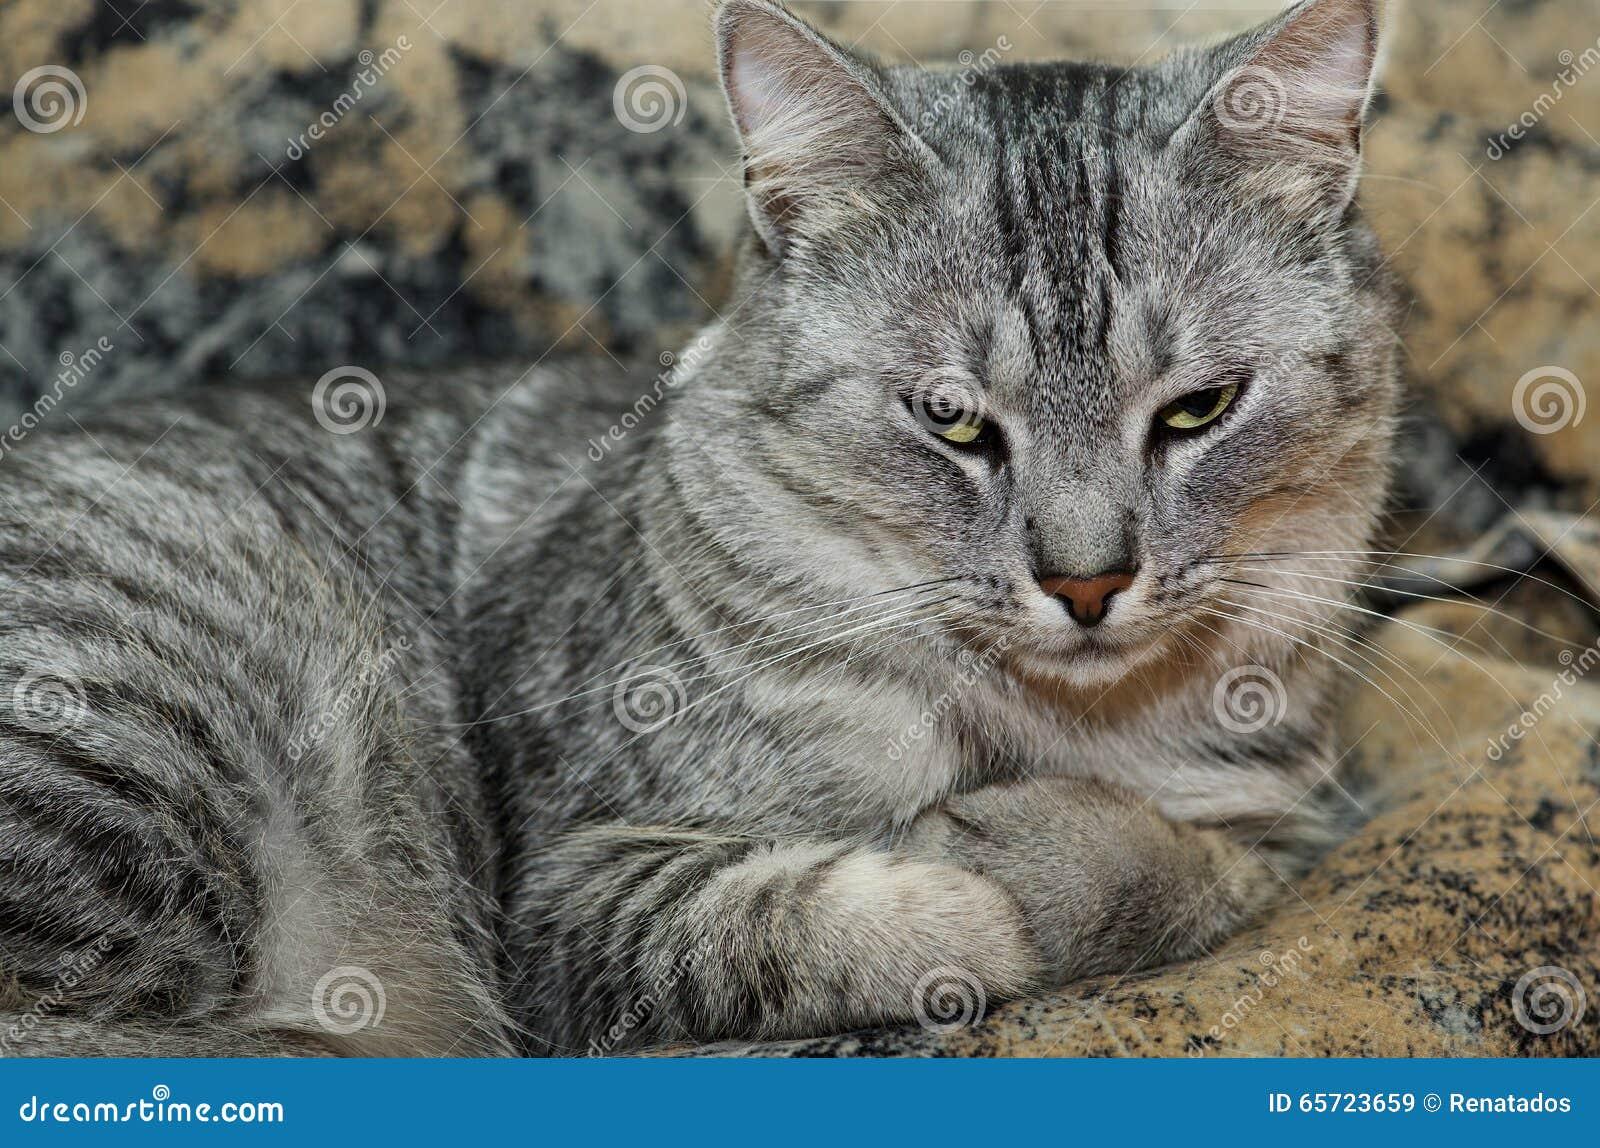 77f7c750d08a Γάτα στο καφετί υπόβαθρο